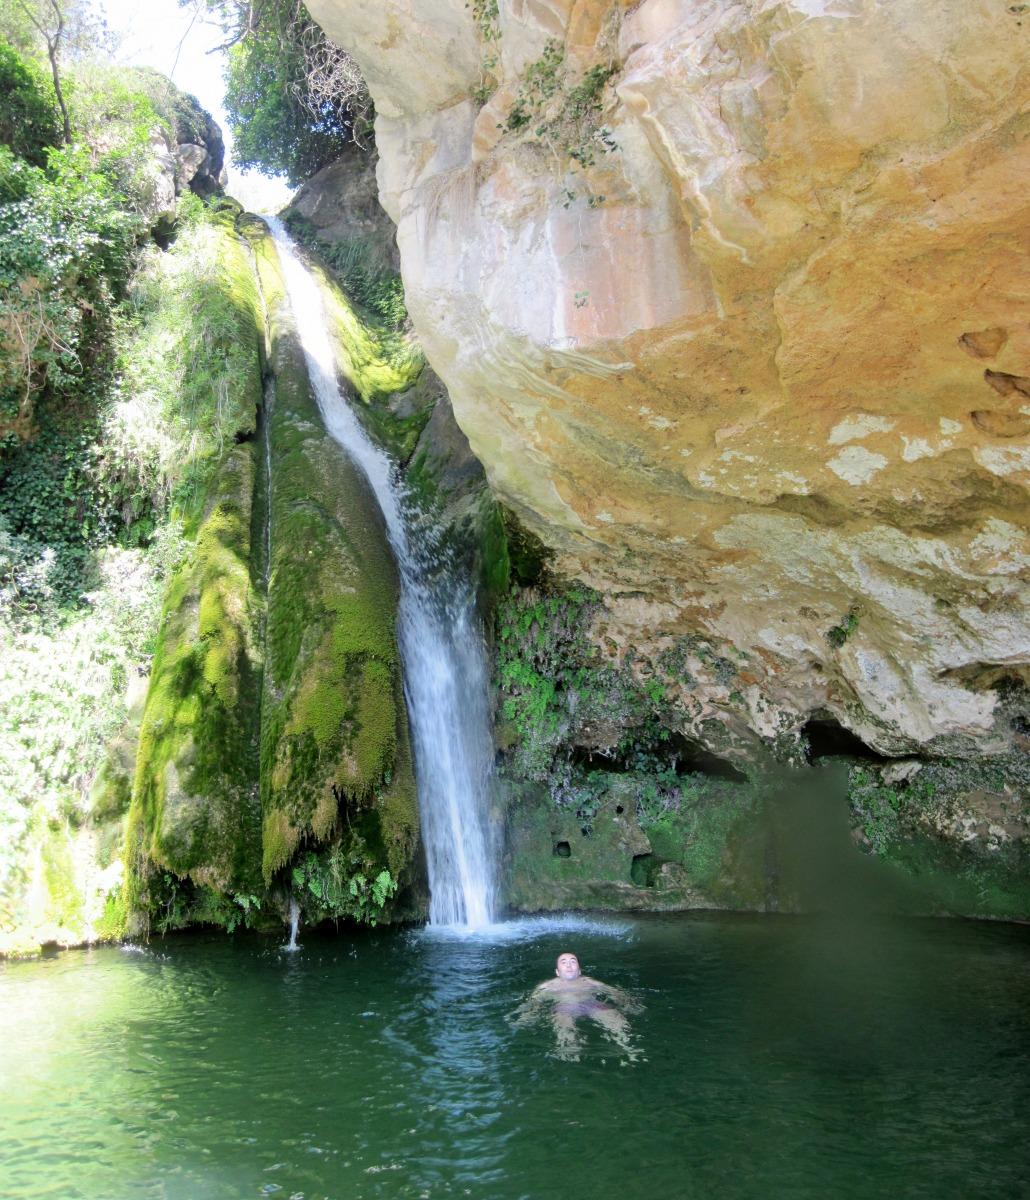 El río Carbó: GR - 7 Villahermosa - Sant Joan de Penyagolosa